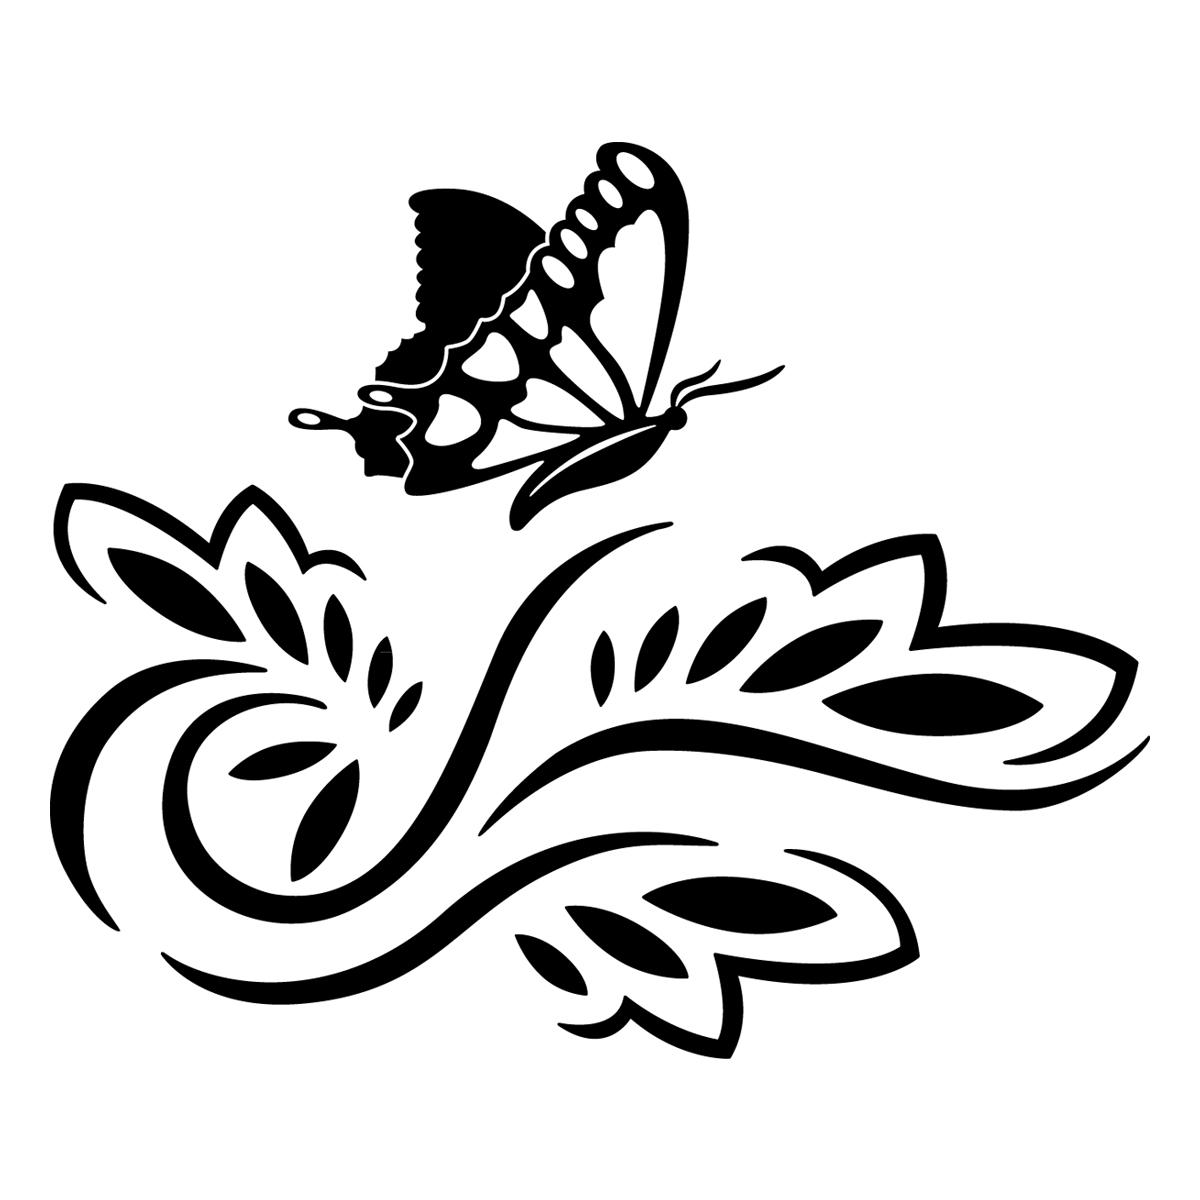 schoenschrift vorlagen dibujos para colorear imagixs tattoo. Black Bedroom Furniture Sets. Home Design Ideas